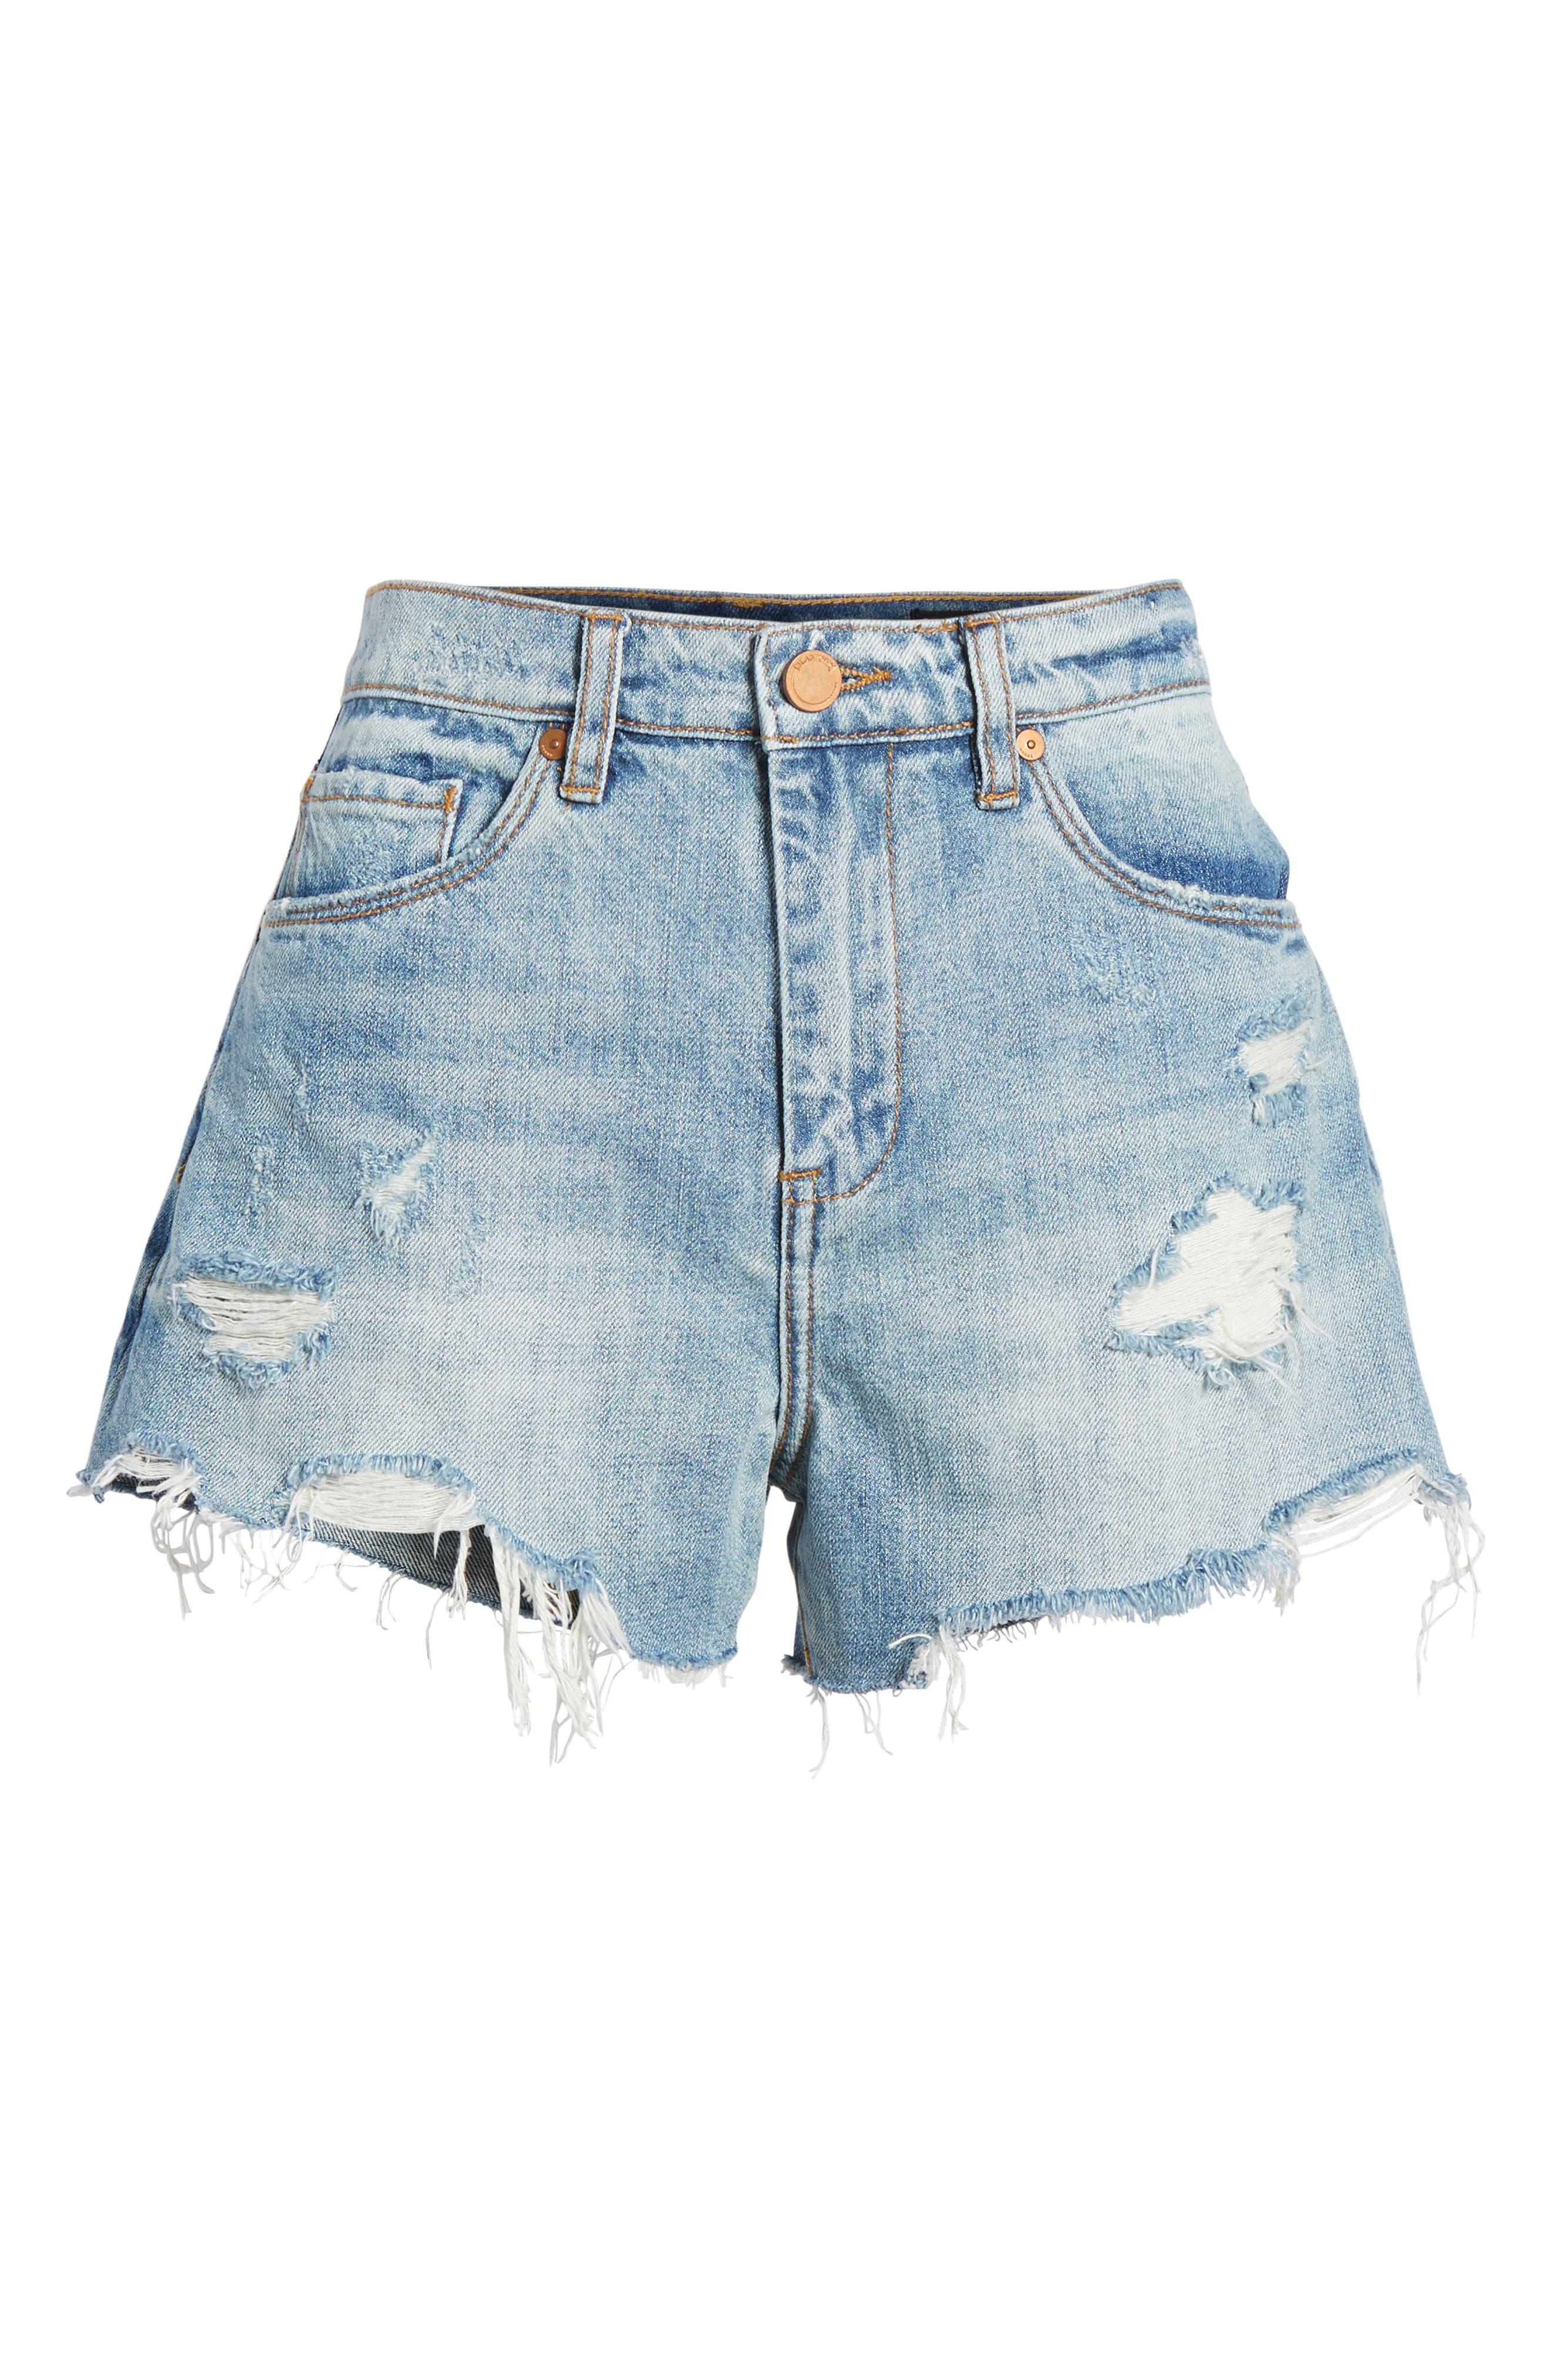 Panic Prevention Ripped Cutoff Denim Shorts,                             Alternate thumbnail 6, color,                             Blue